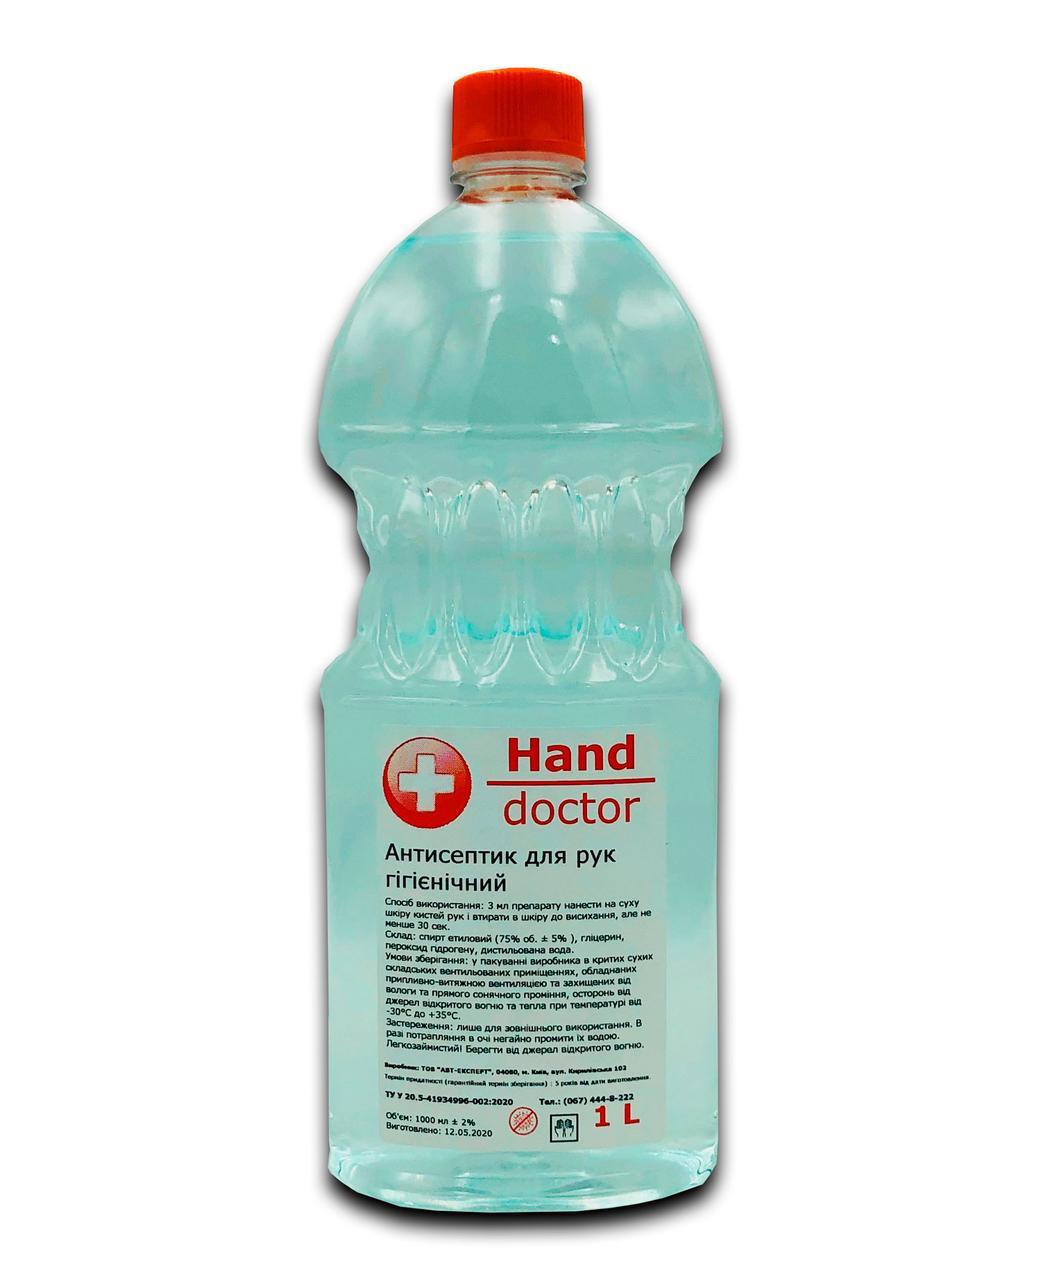 Антисептик спиртовой для рук 75% спирта Hand Doctor 1 л